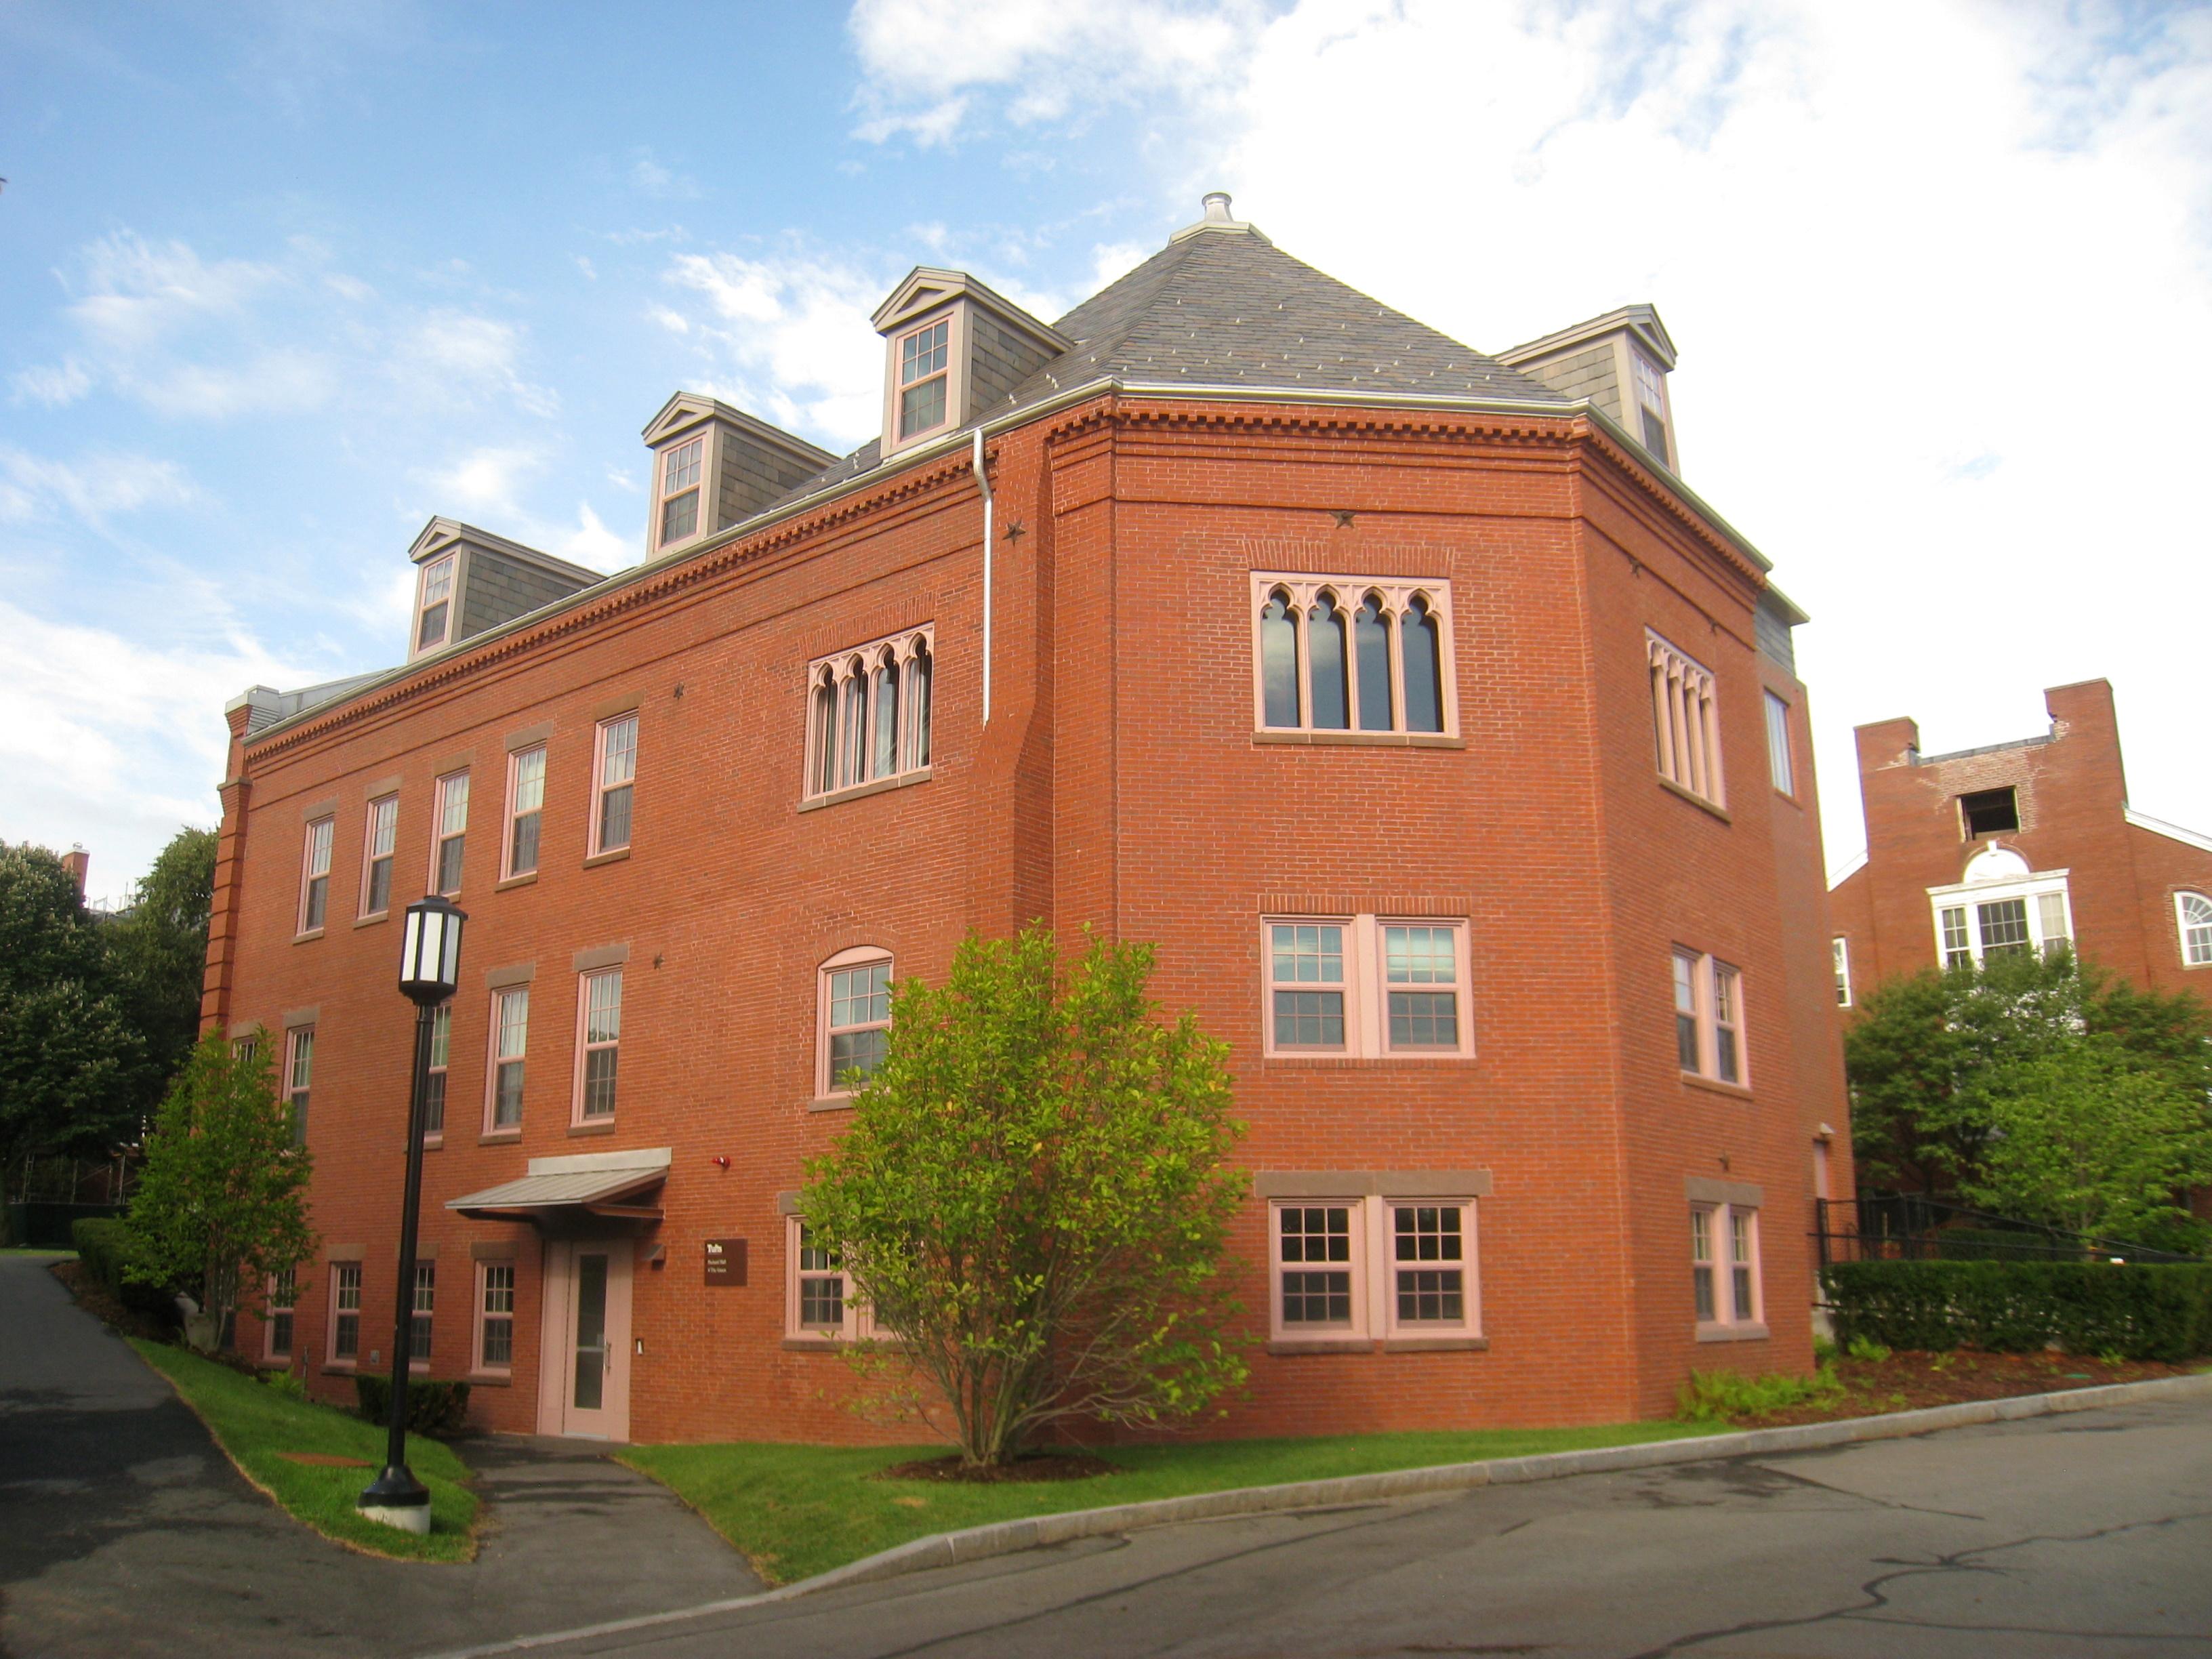 tufts university wiki everipedia